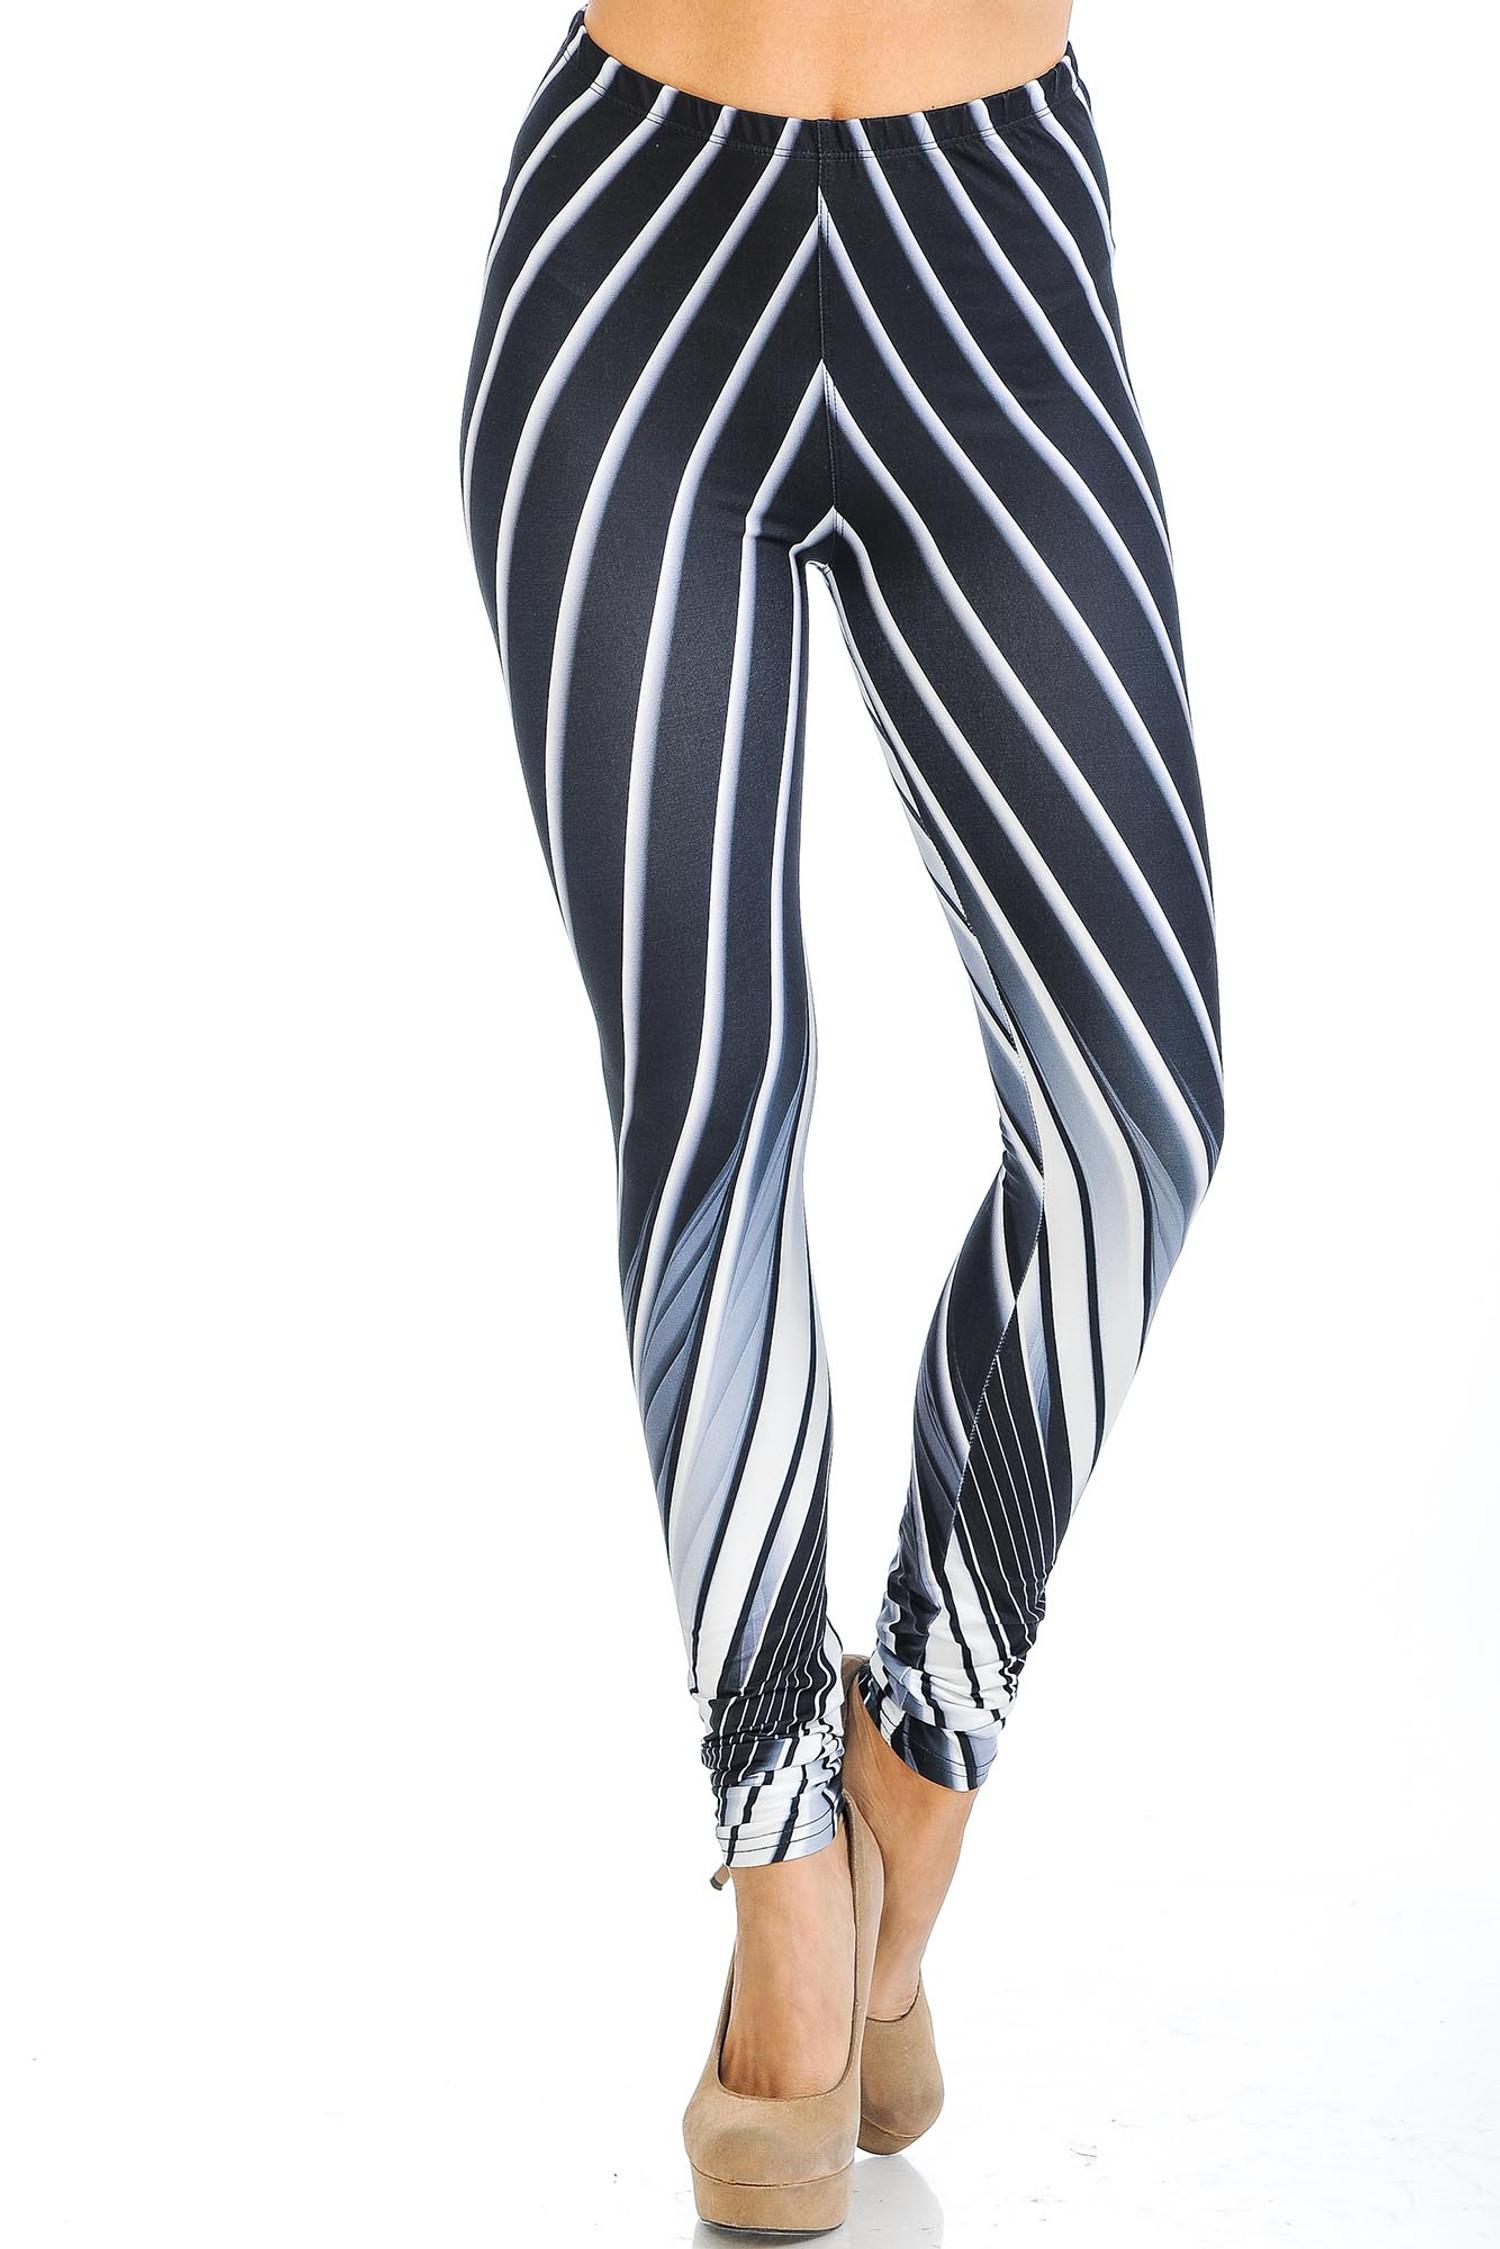 Creamy Soft Contour Body Lines Extra Small Leggings - USA Fashion™